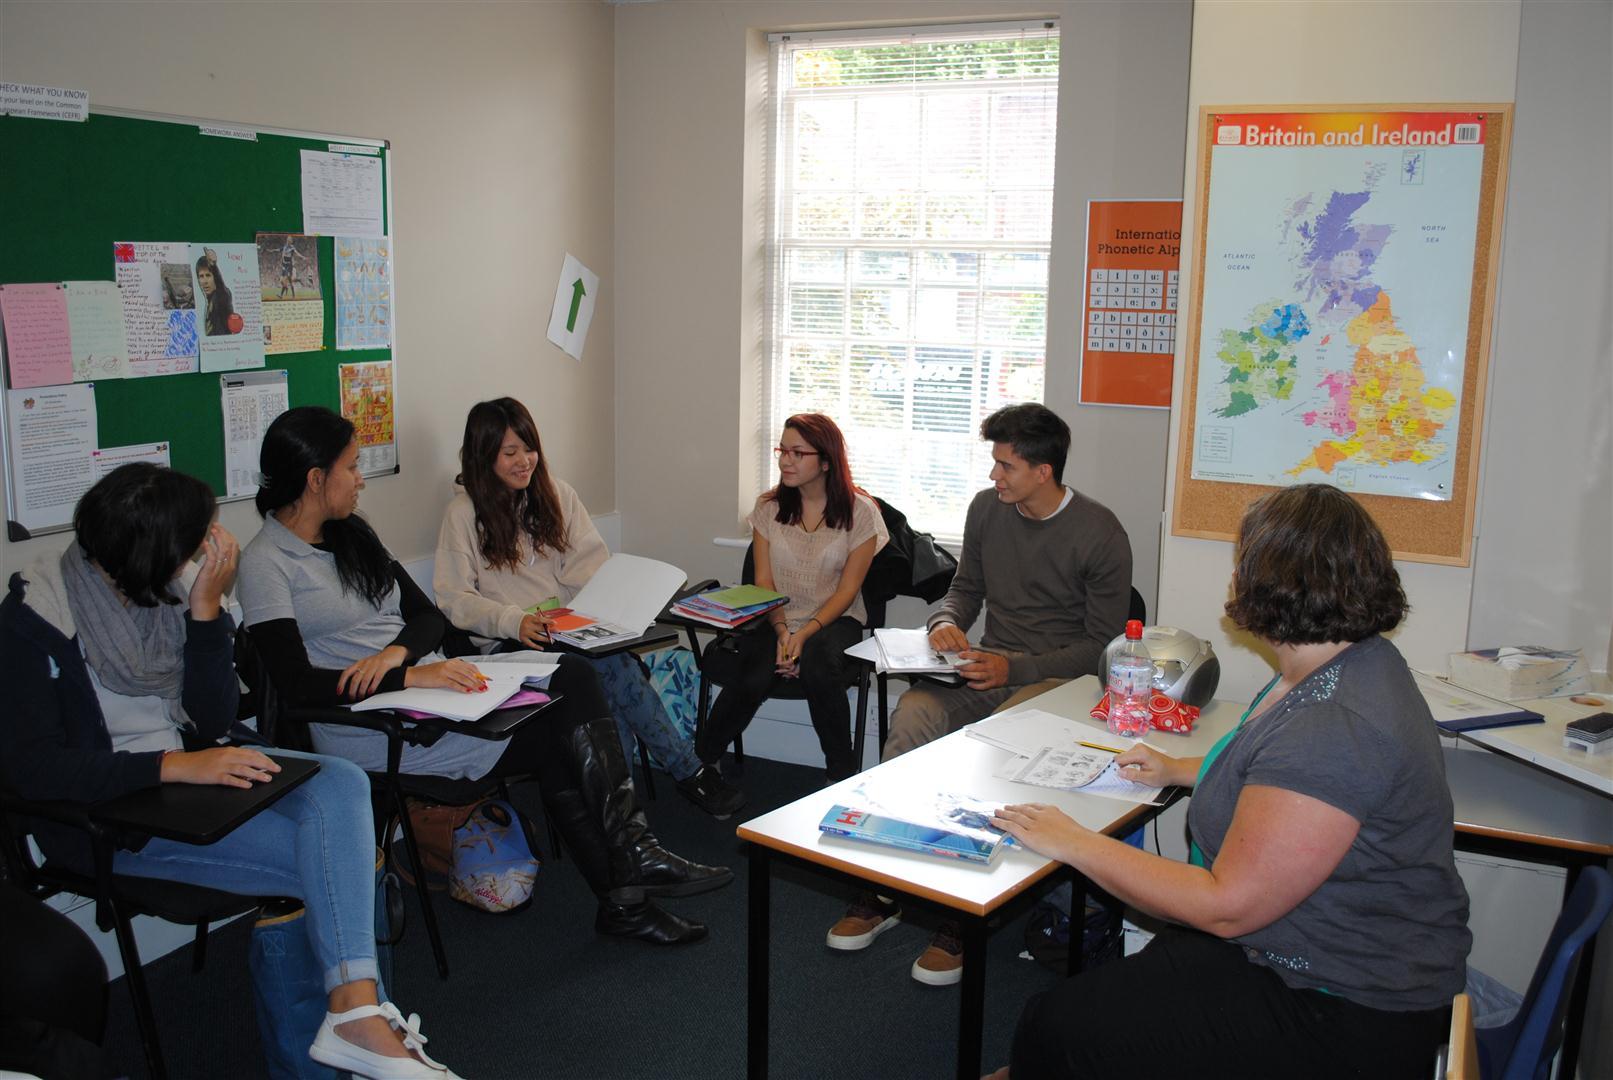 CES-londra-ingiltere-ingilizce-dil-okulu-ingiltere-egitimi-4.JPG